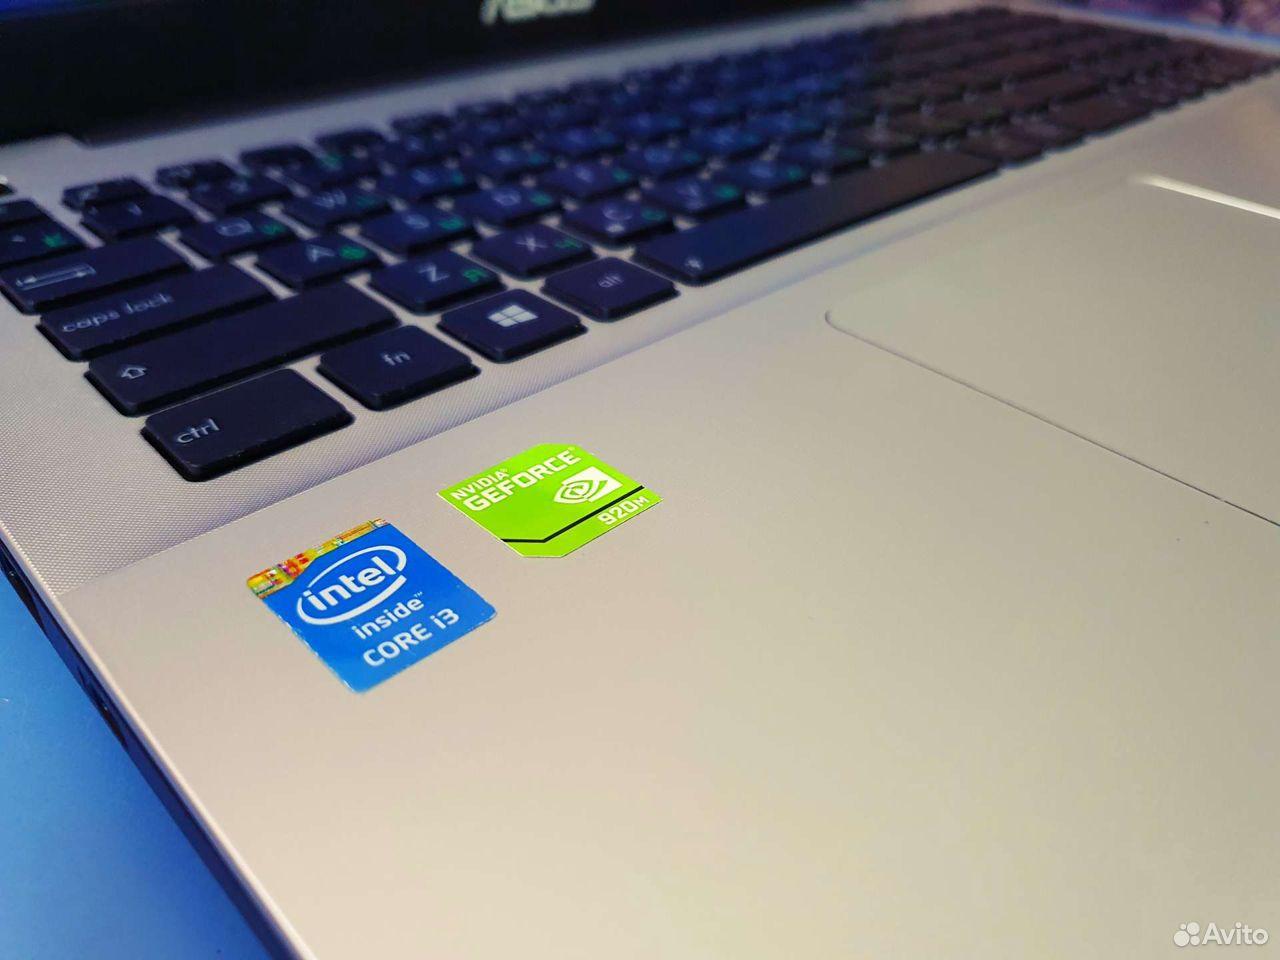 Игровой Asus на базе intel core и Nvidia 920M